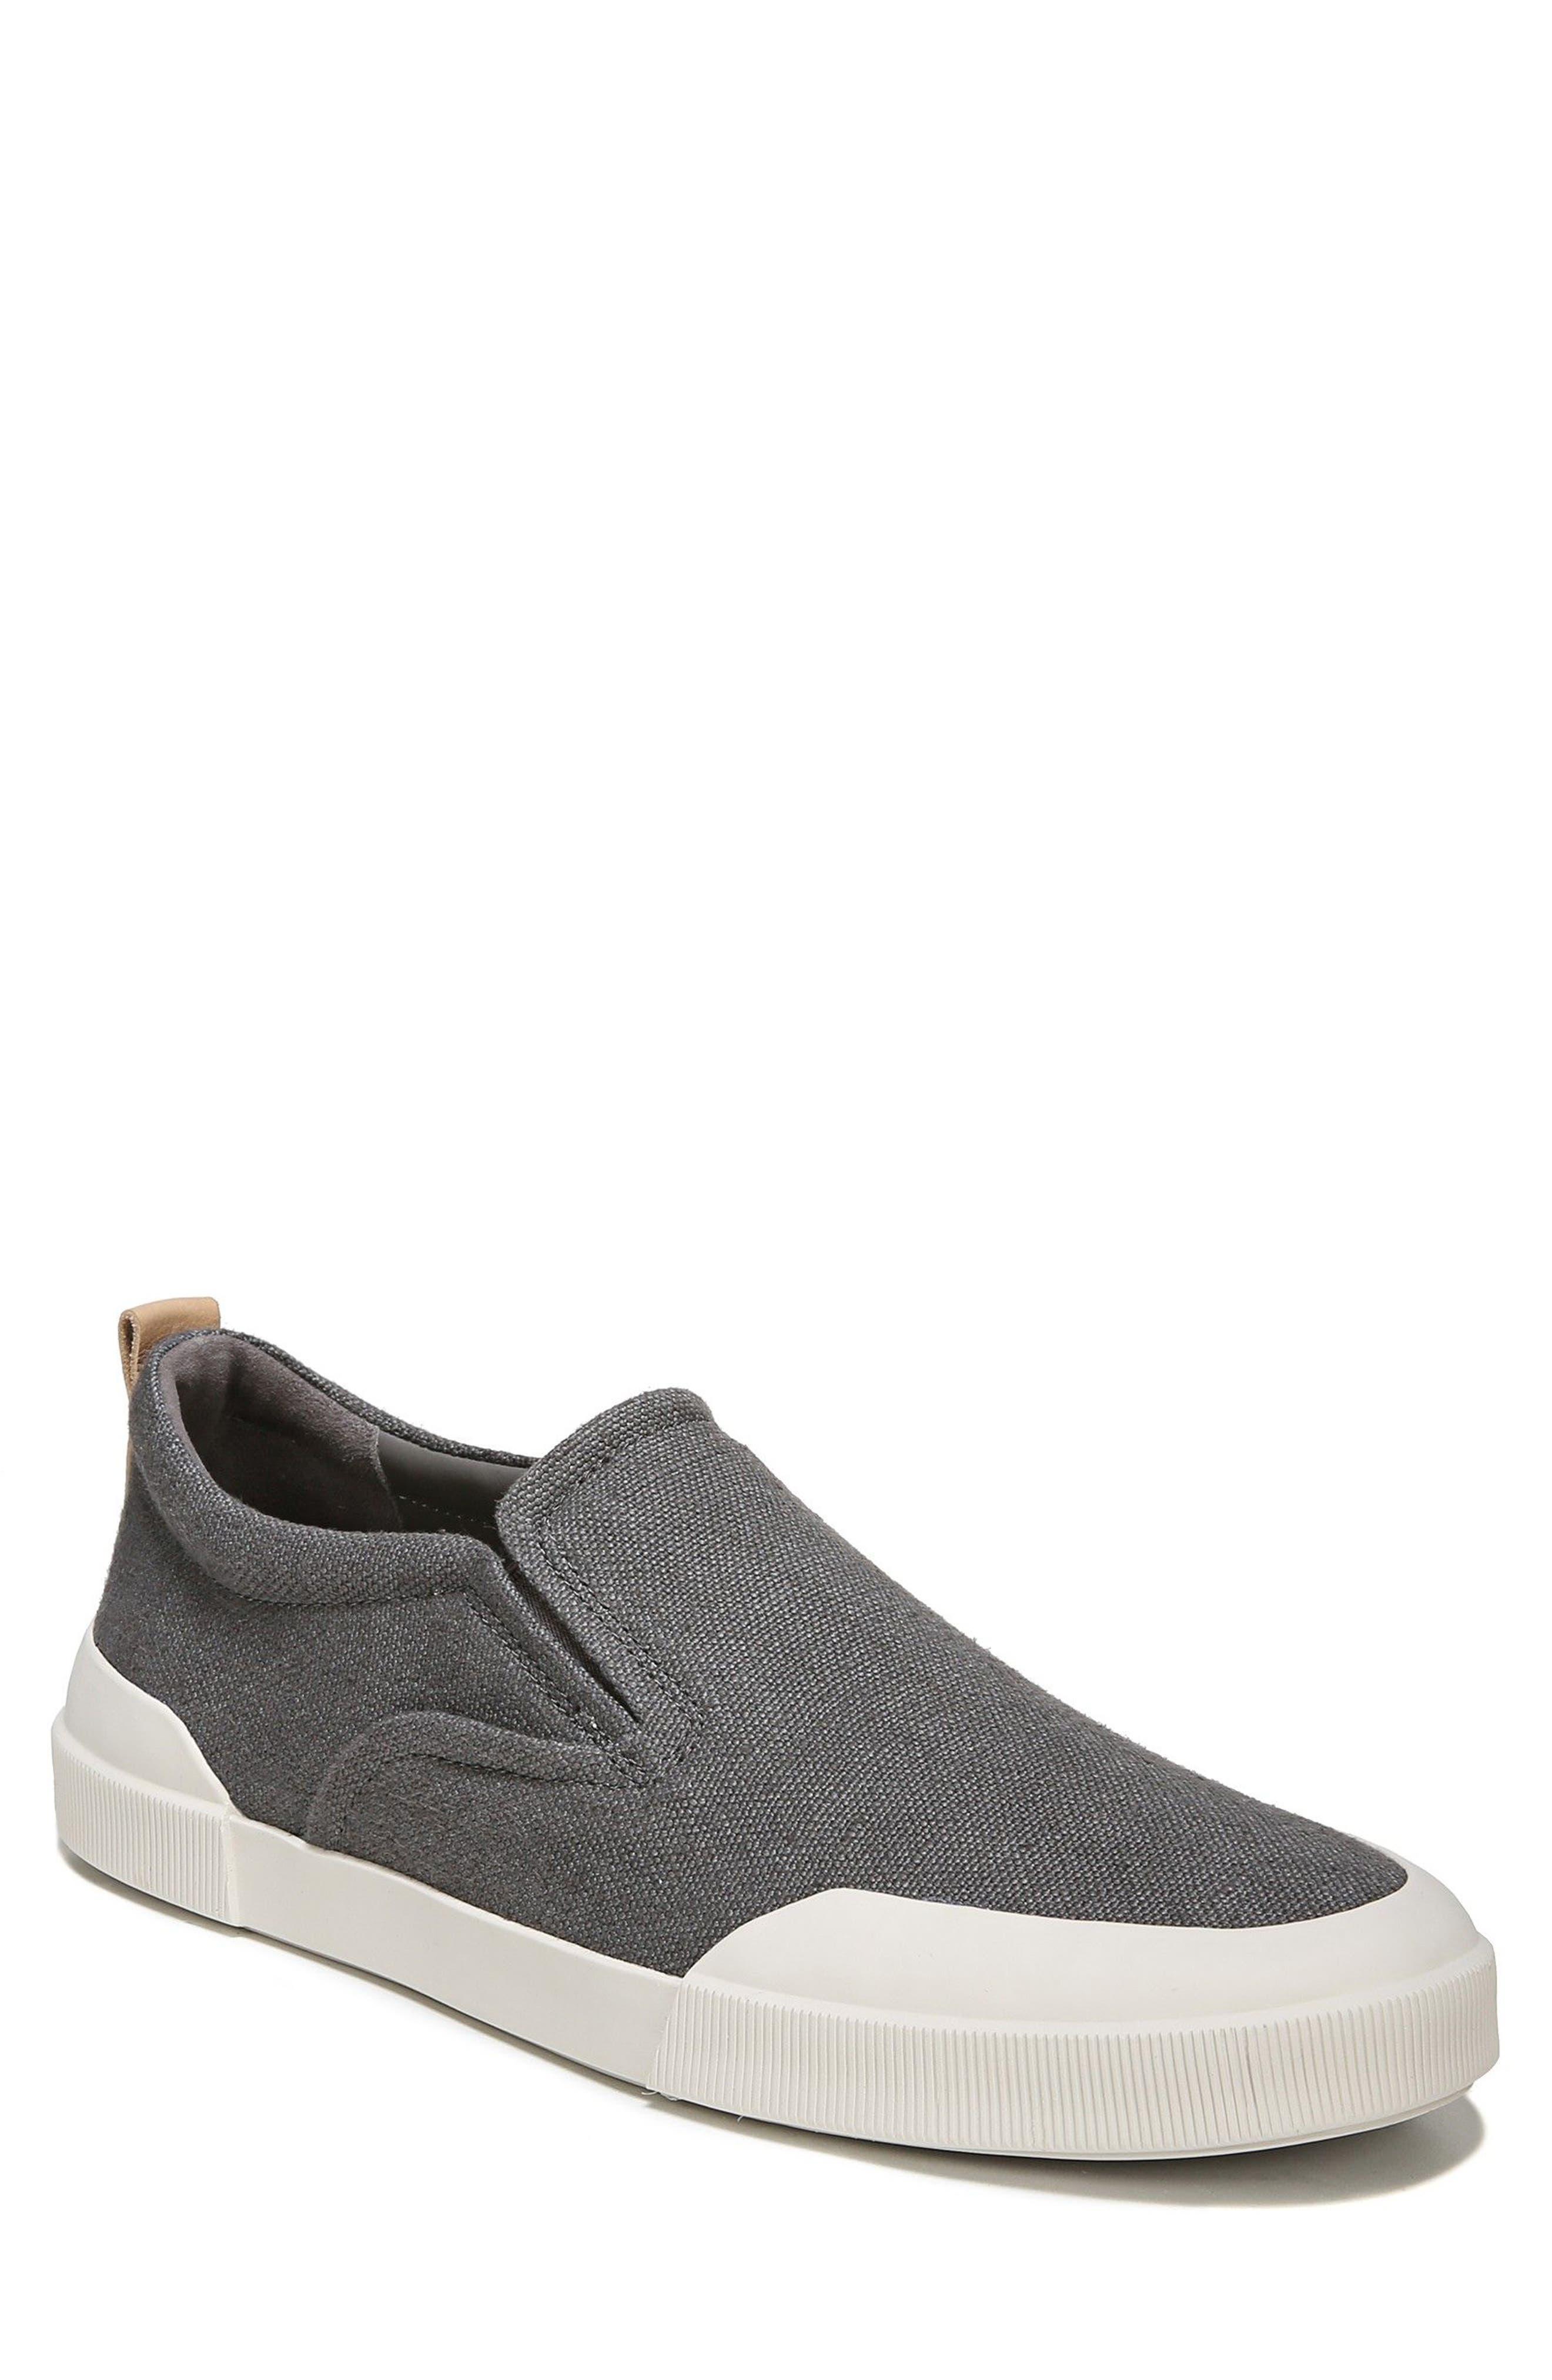 Vernon Slip-On Sneaker,                         Main,                         color,